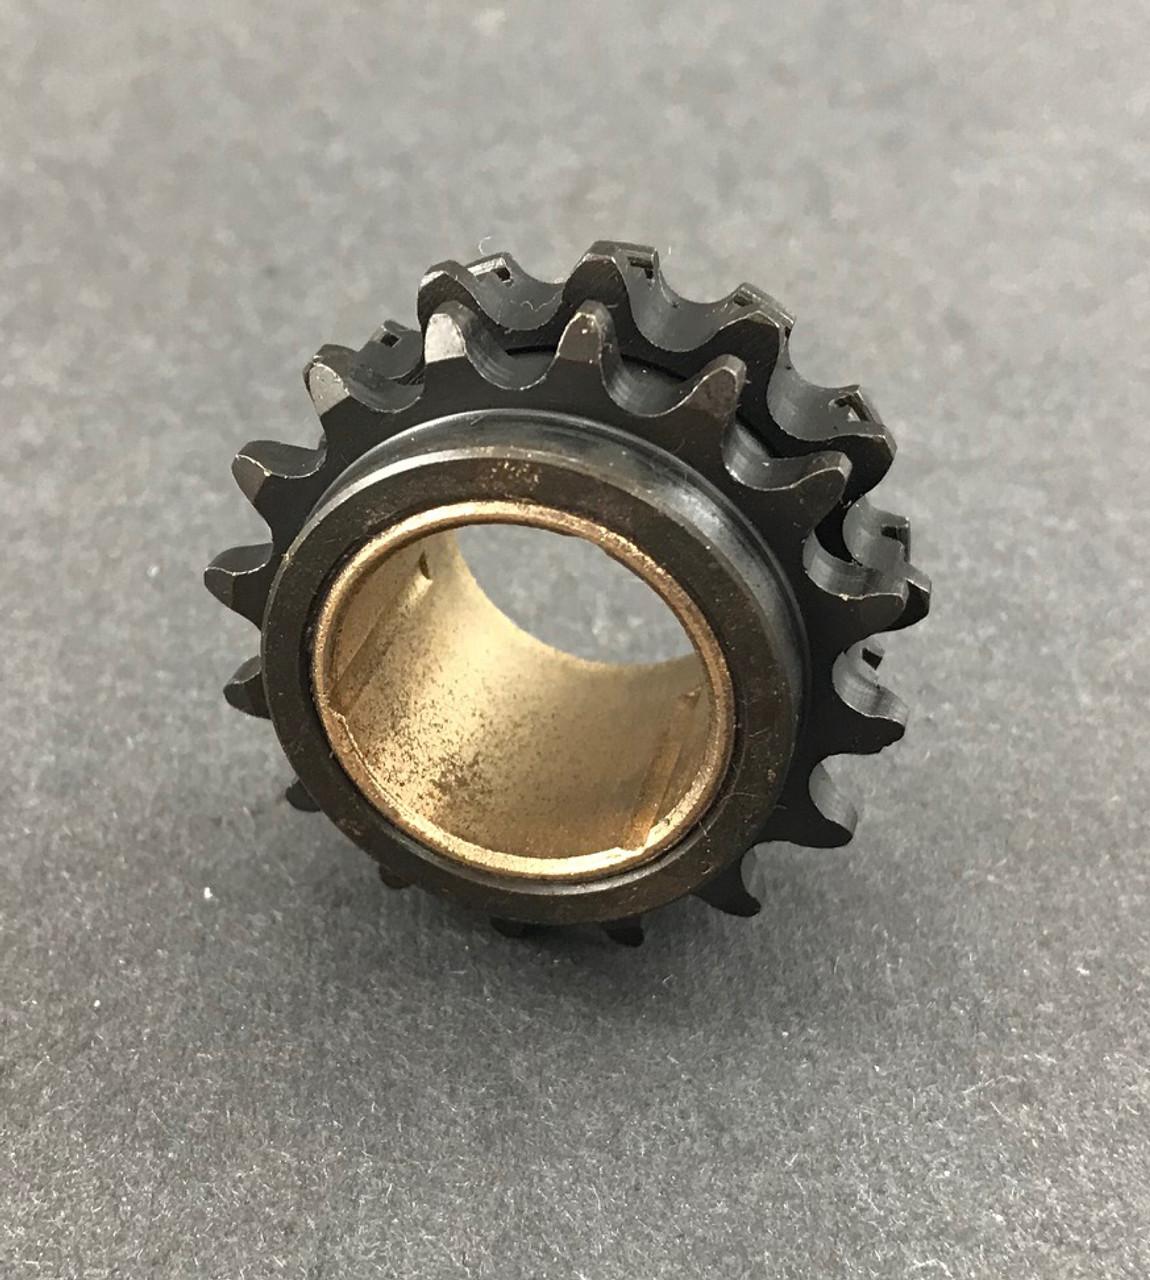 Max Torque Clutch Sprocket - 16 Tooth - 219 Chain